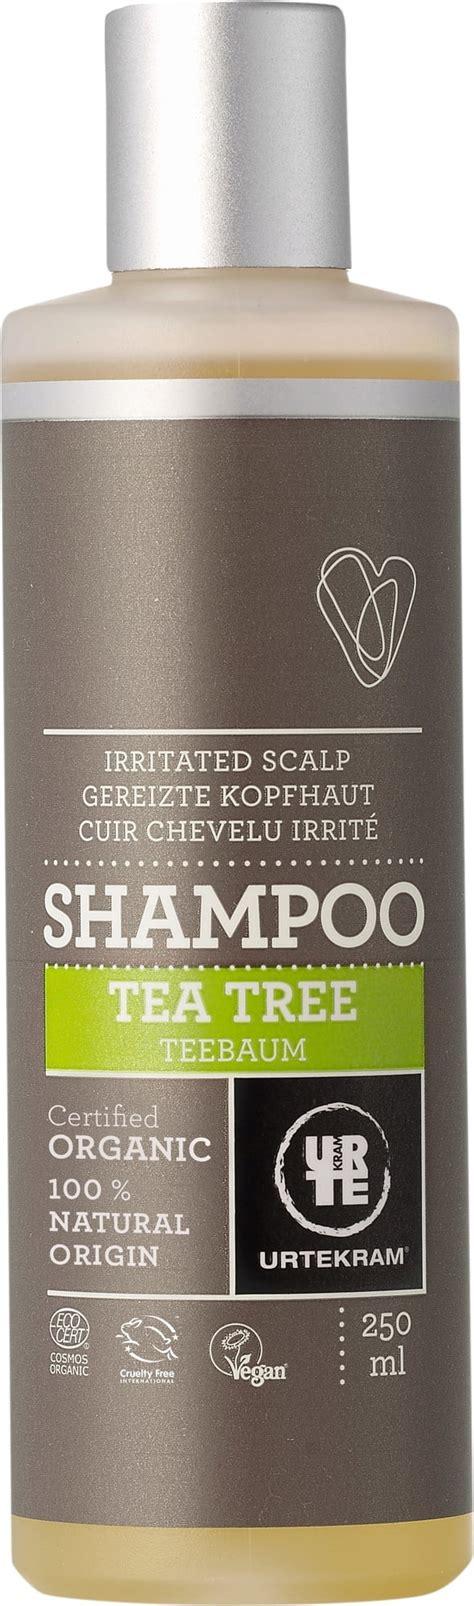 Urtekram Organic Tea Tree Shoo 250ml 1 urtekram organic tea tree shoo ecco verde shop